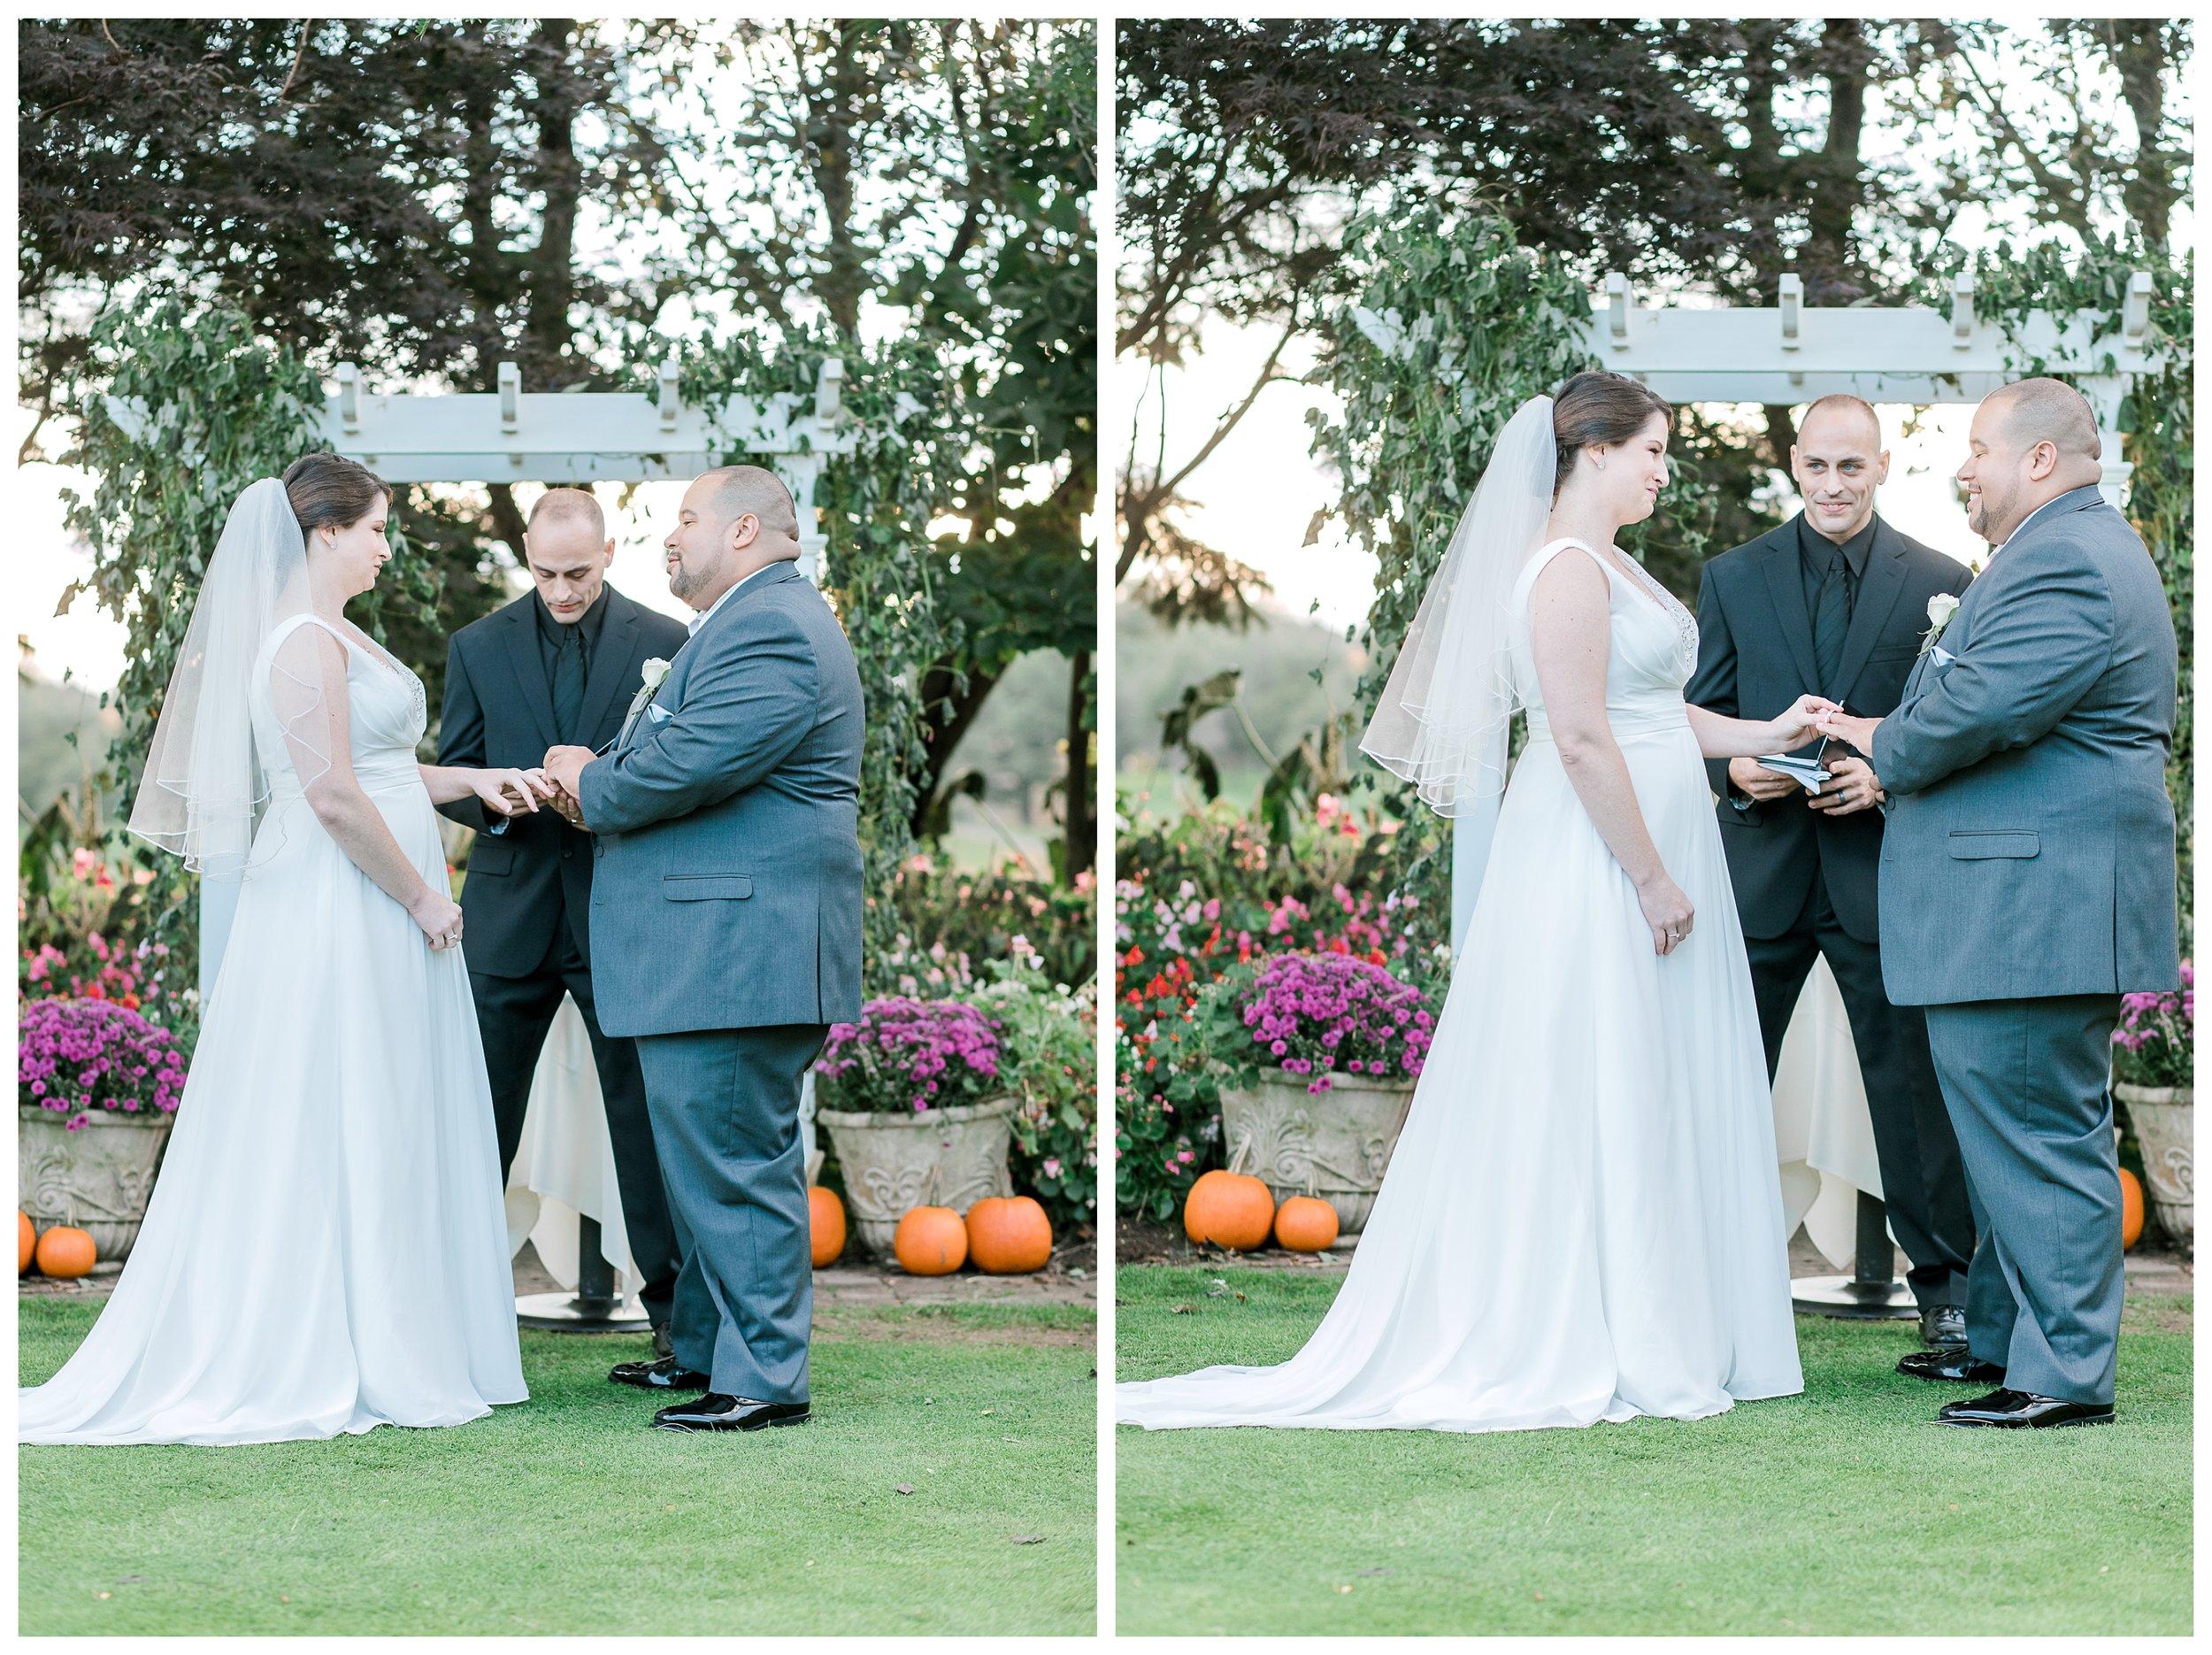 pleasant_valley_country_club_wedding_sutton_erica_pezente_photography (52).jpg